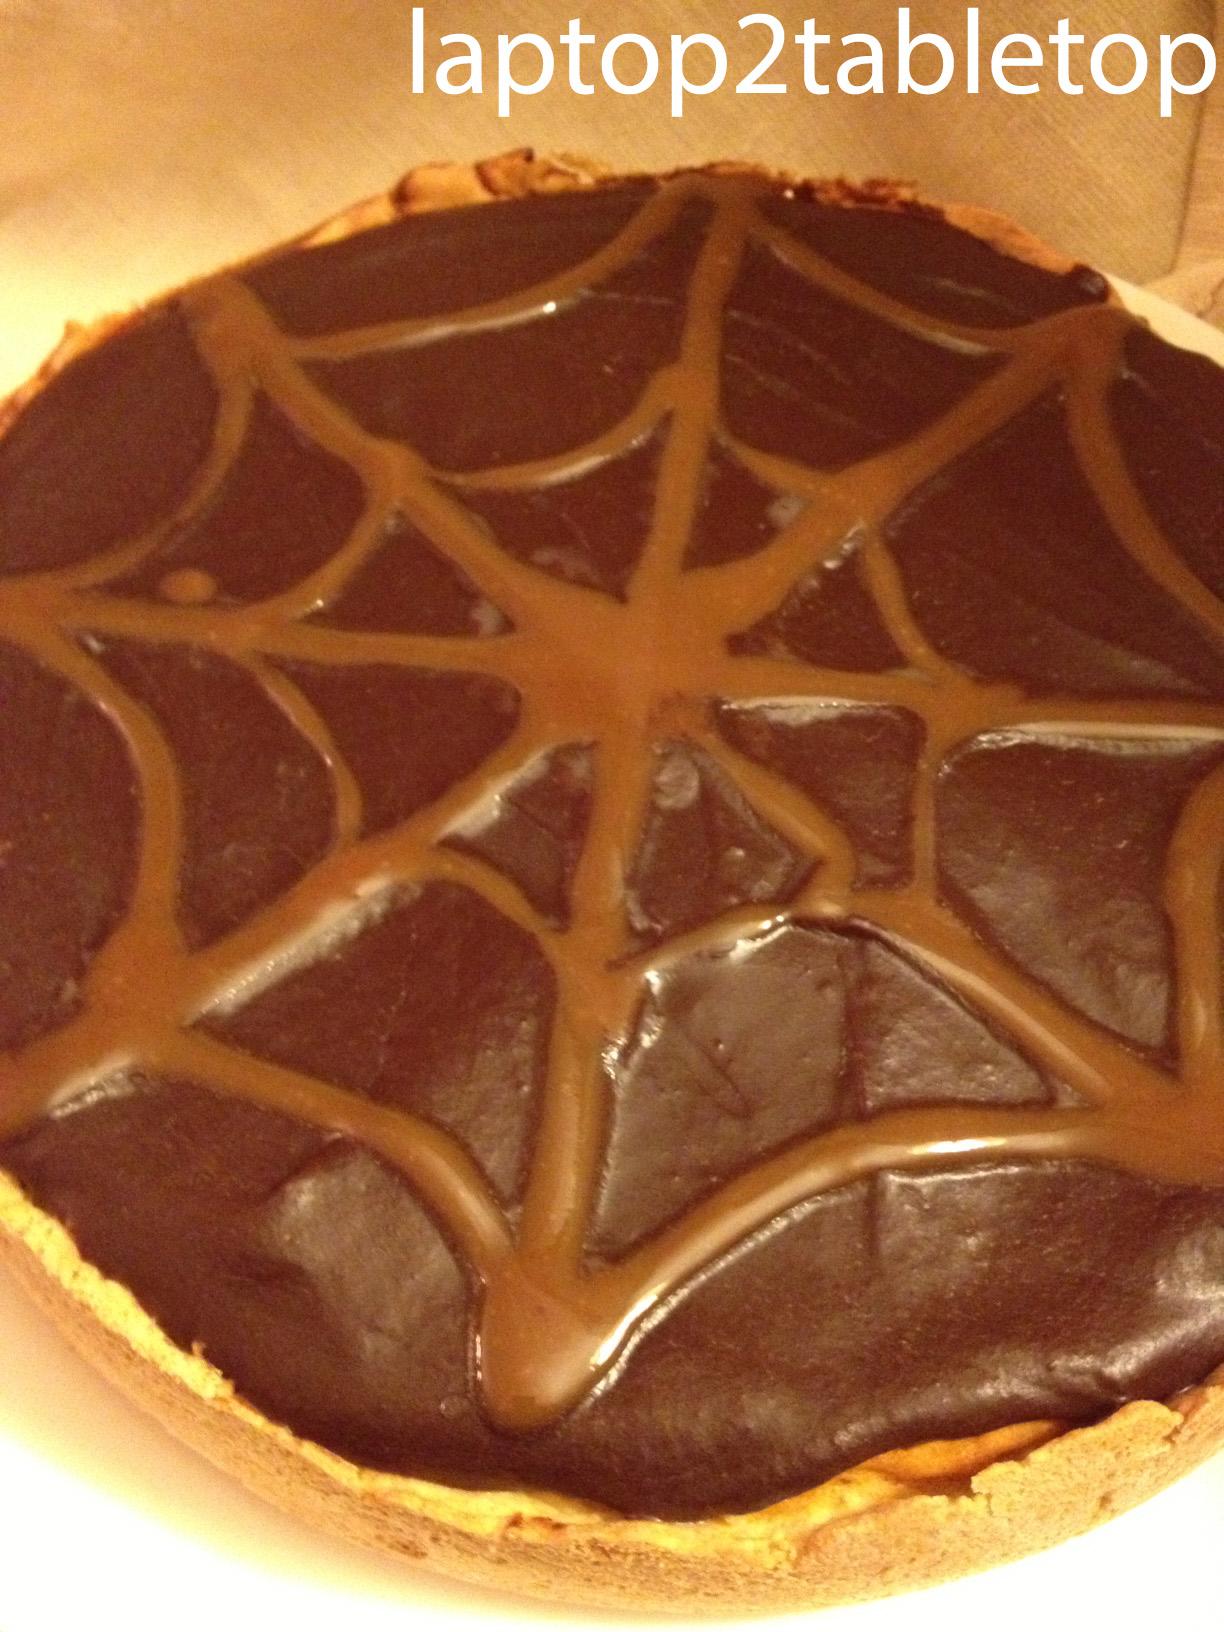 can of pumpkin puree to the cake, I made chocolate and caramel ganache ...